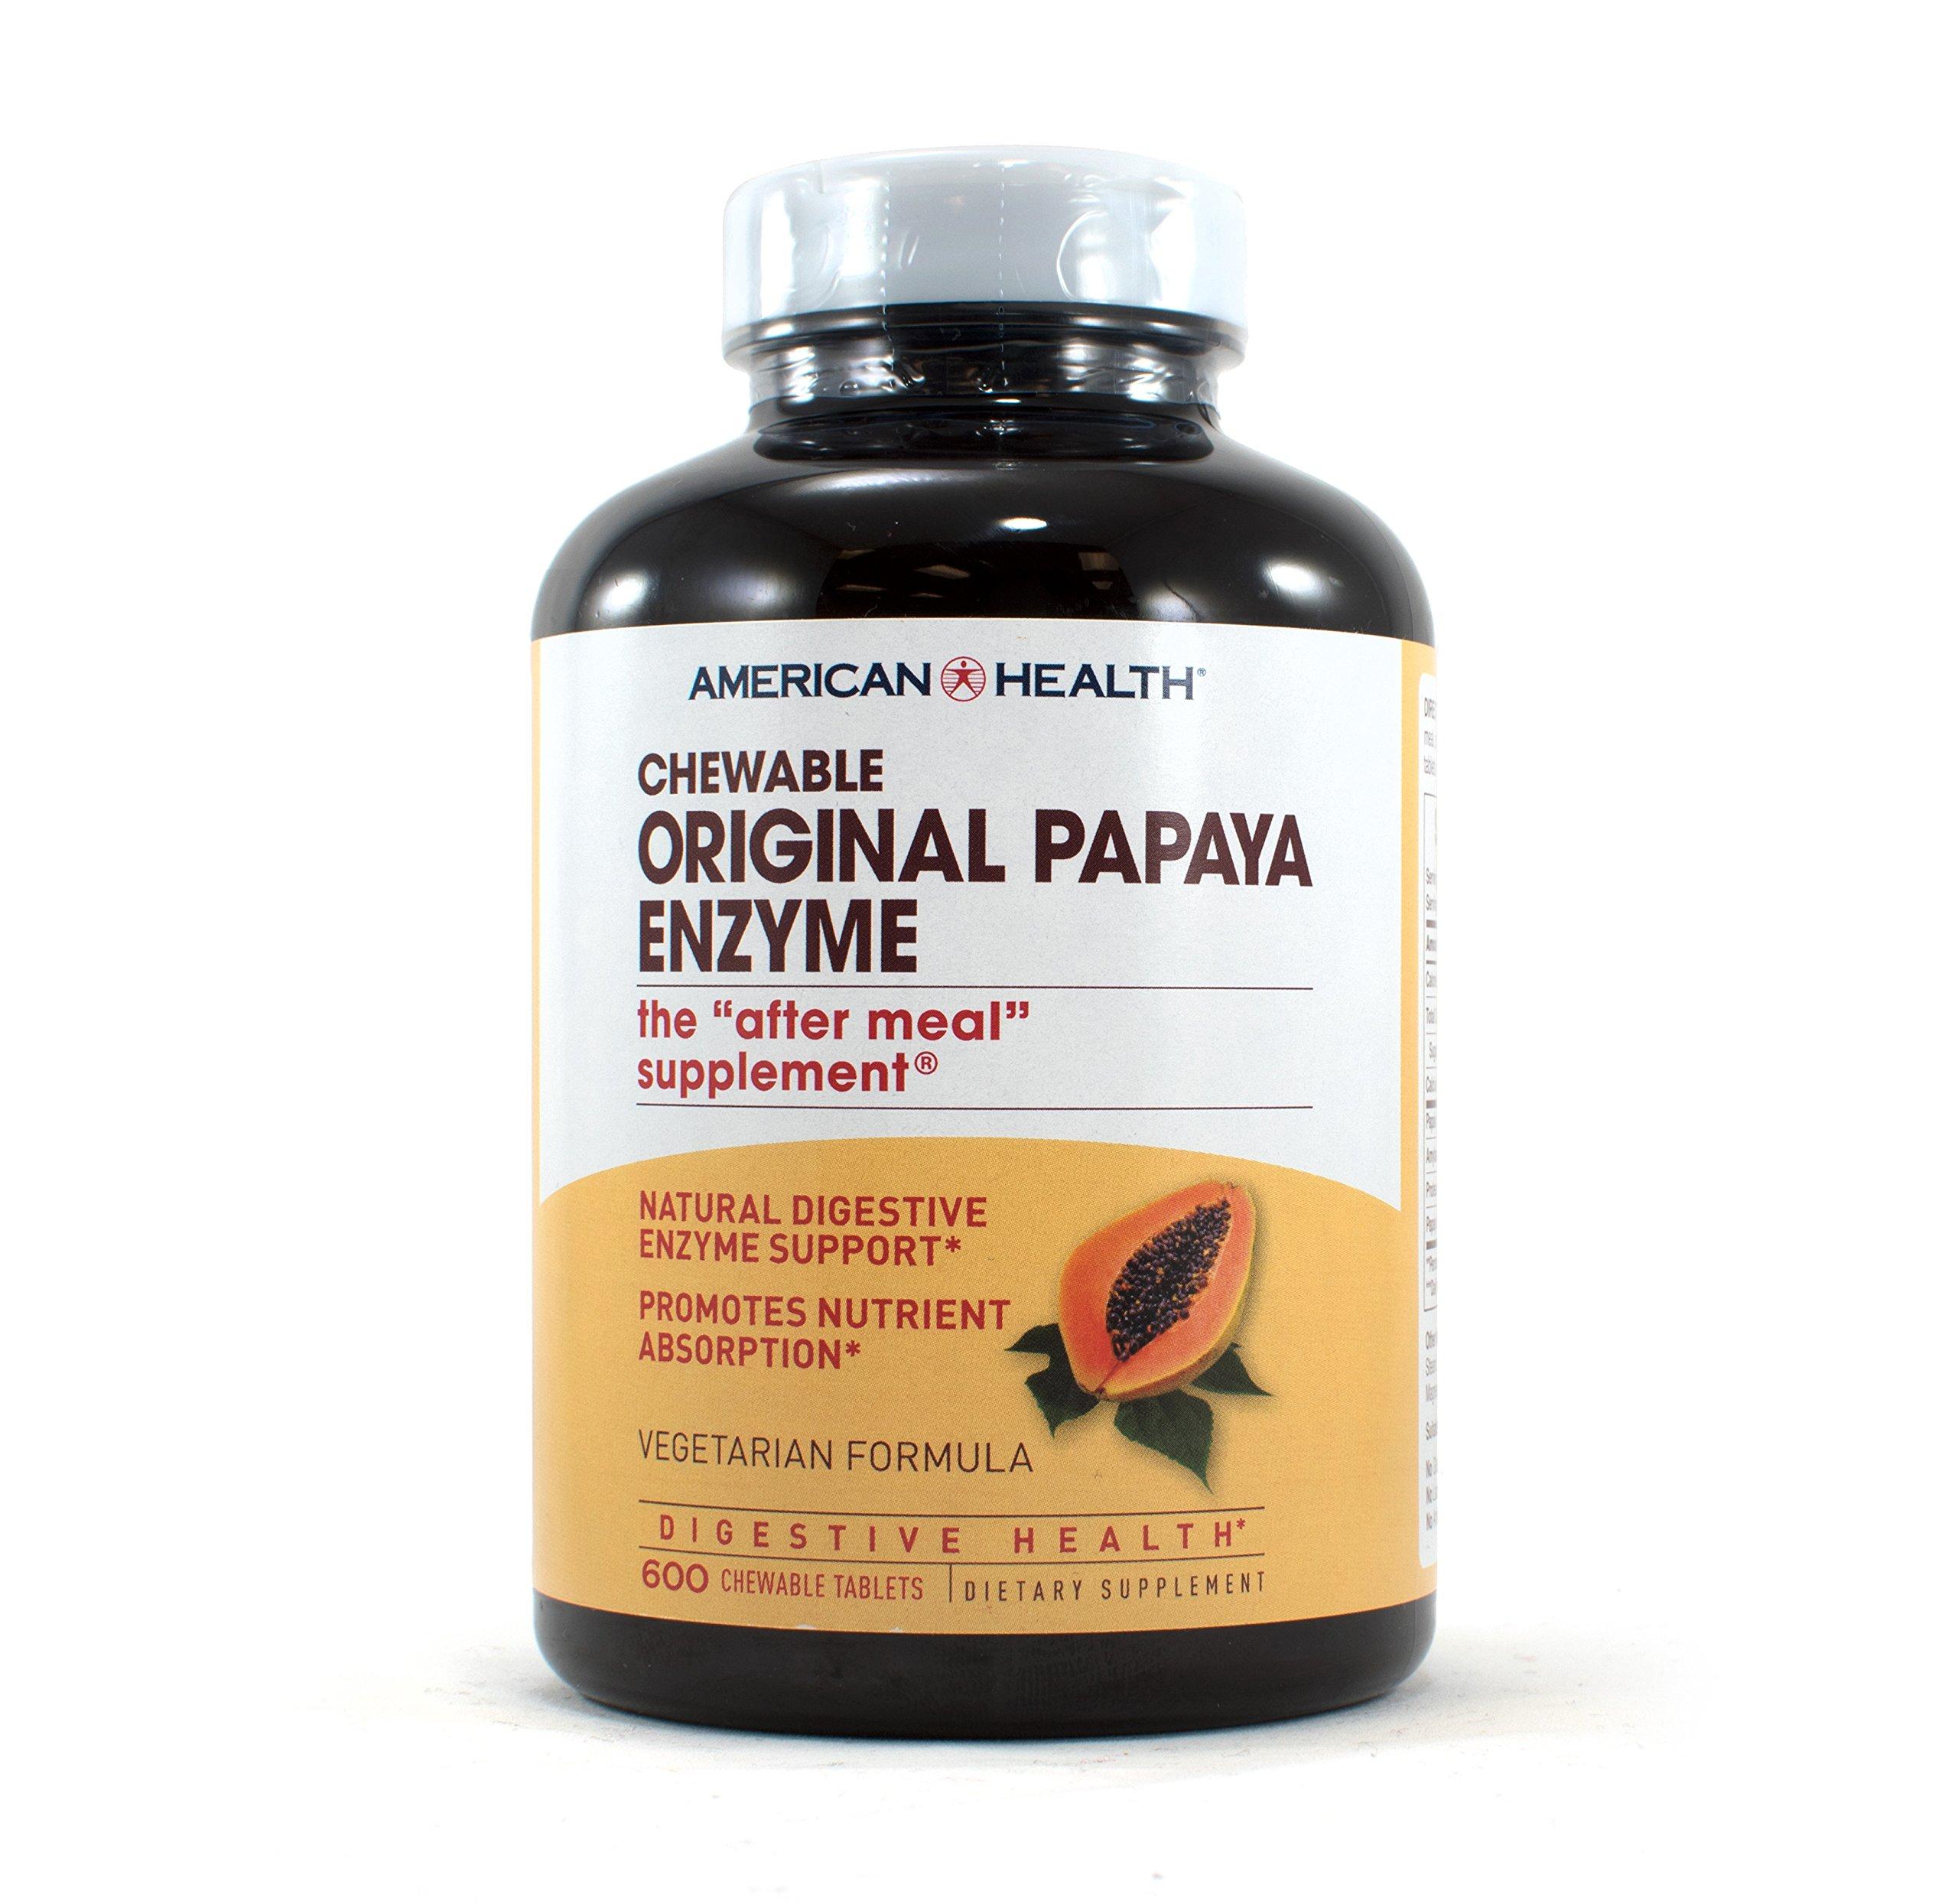 American Health Original Papaya Enzyme, 600 Count